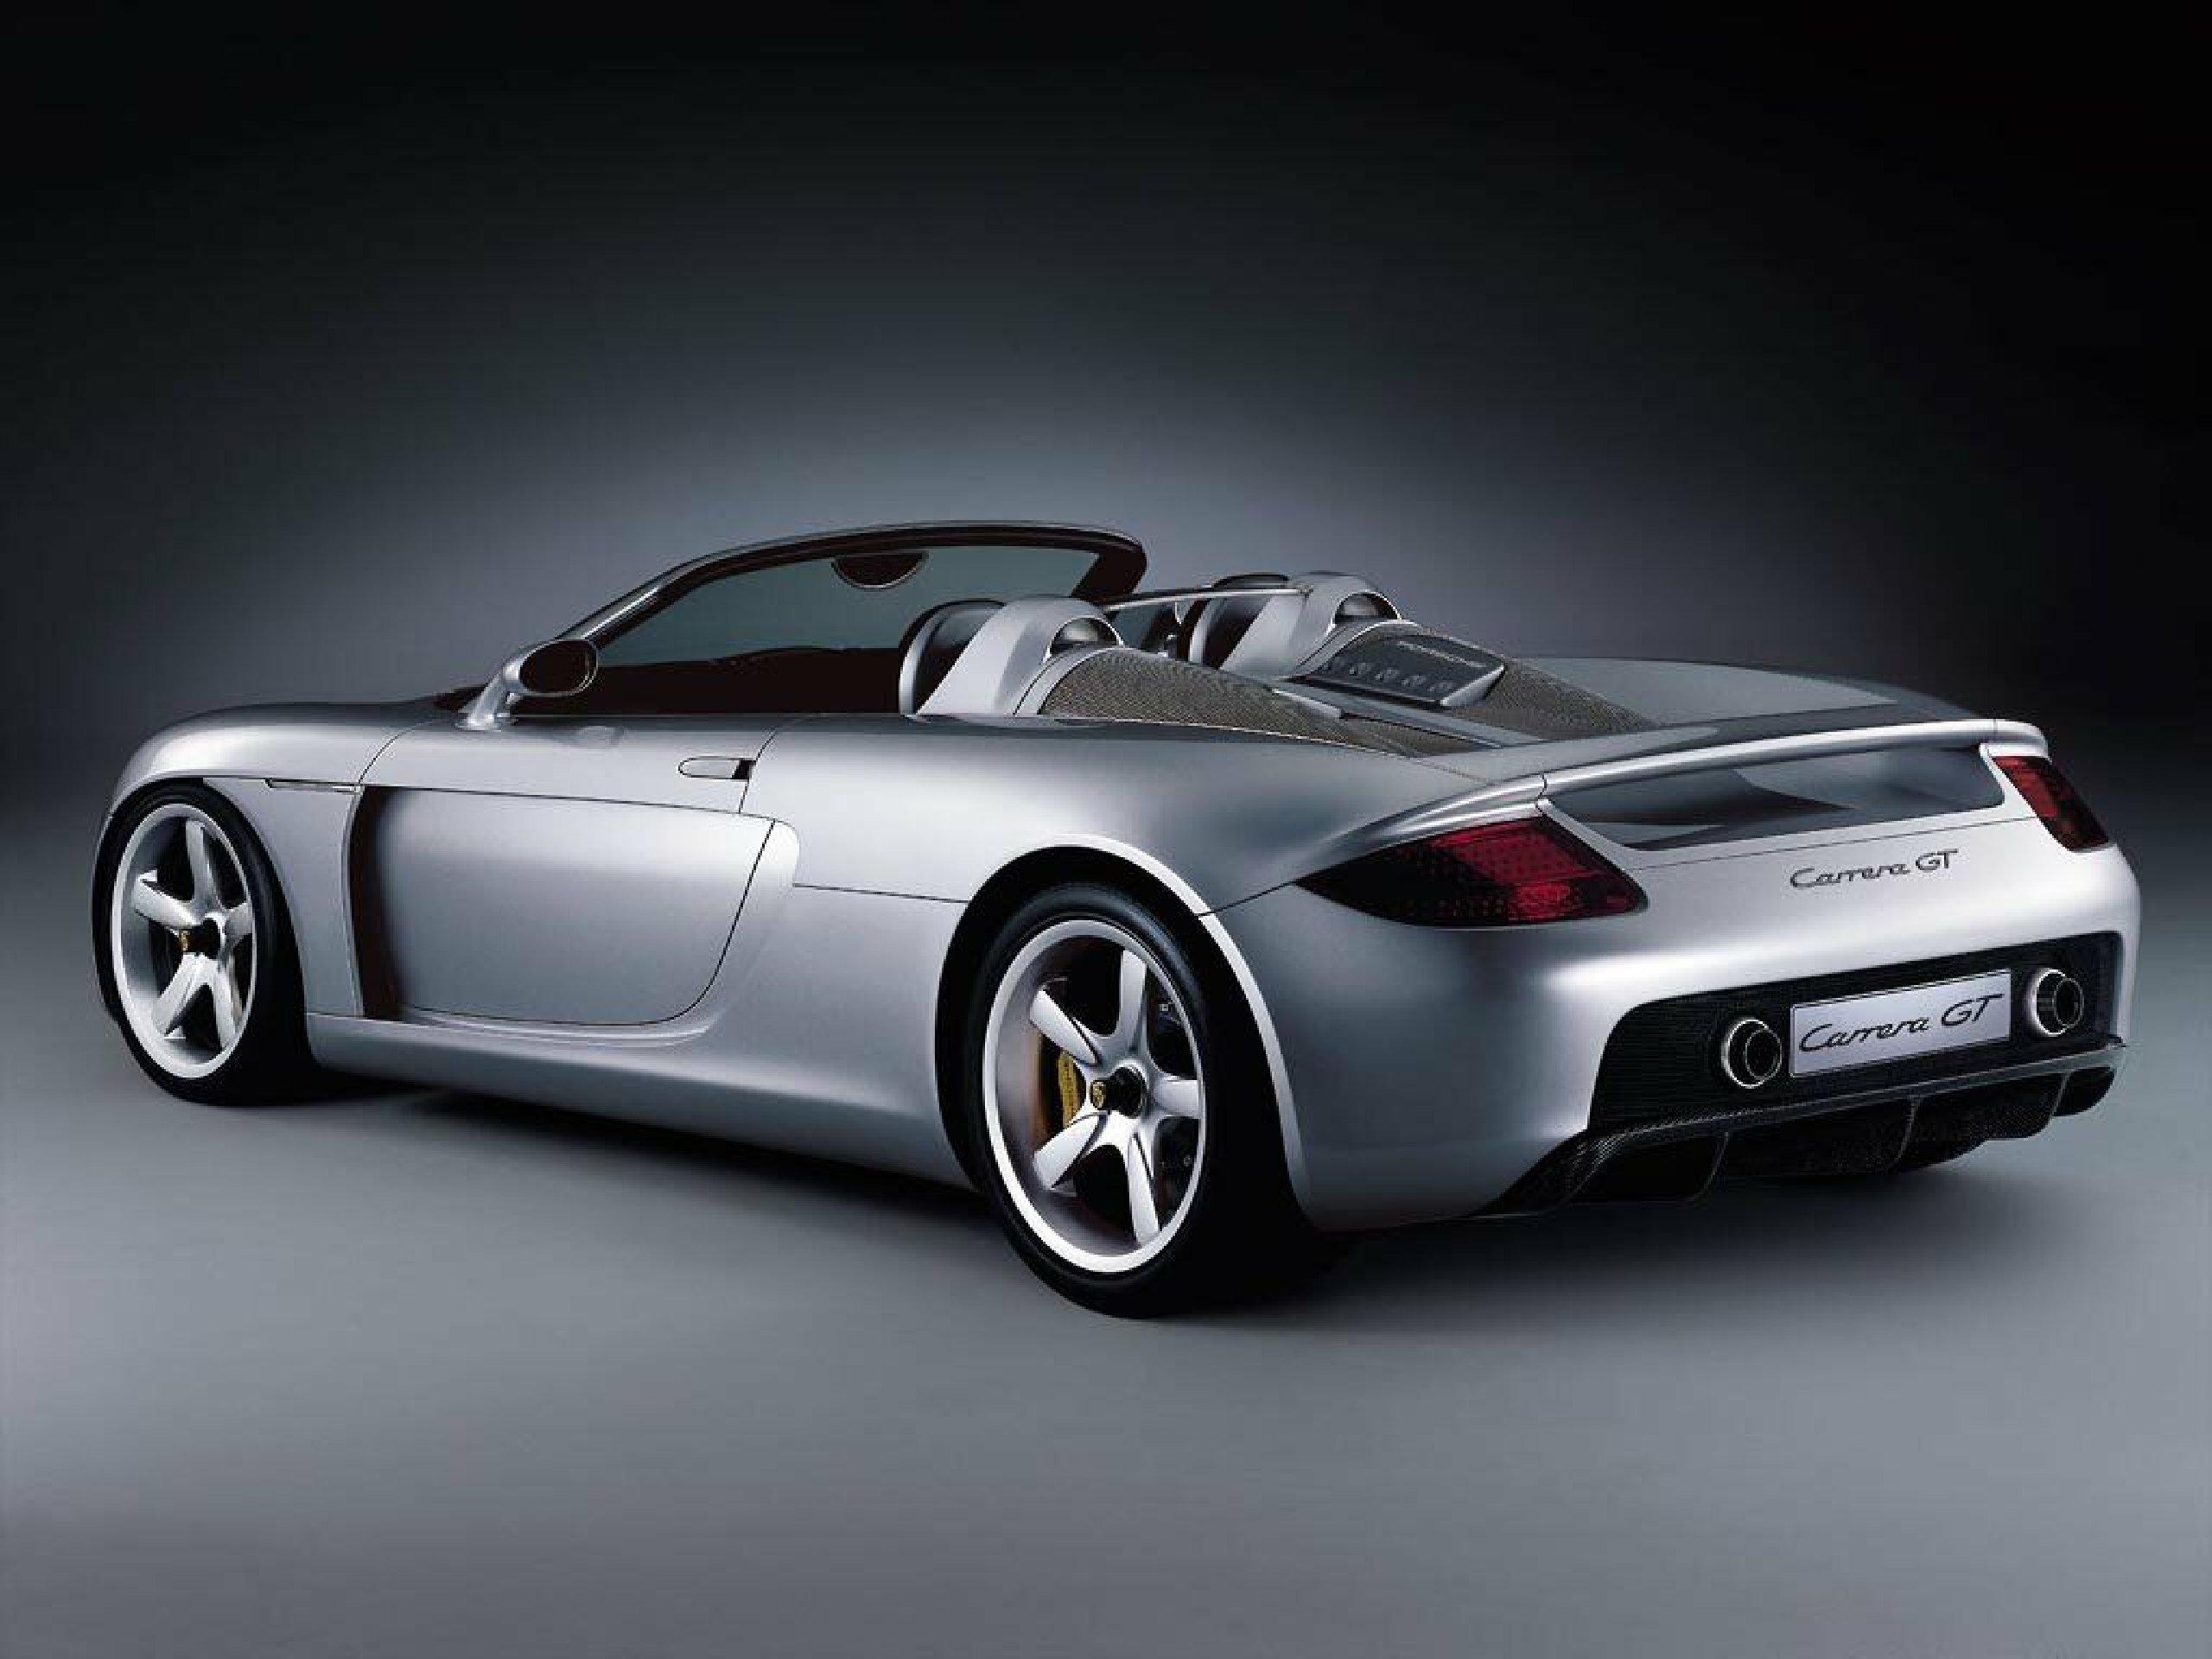 Hd Cool Car Wallpapers Fast Cars: Samochody Uliczne